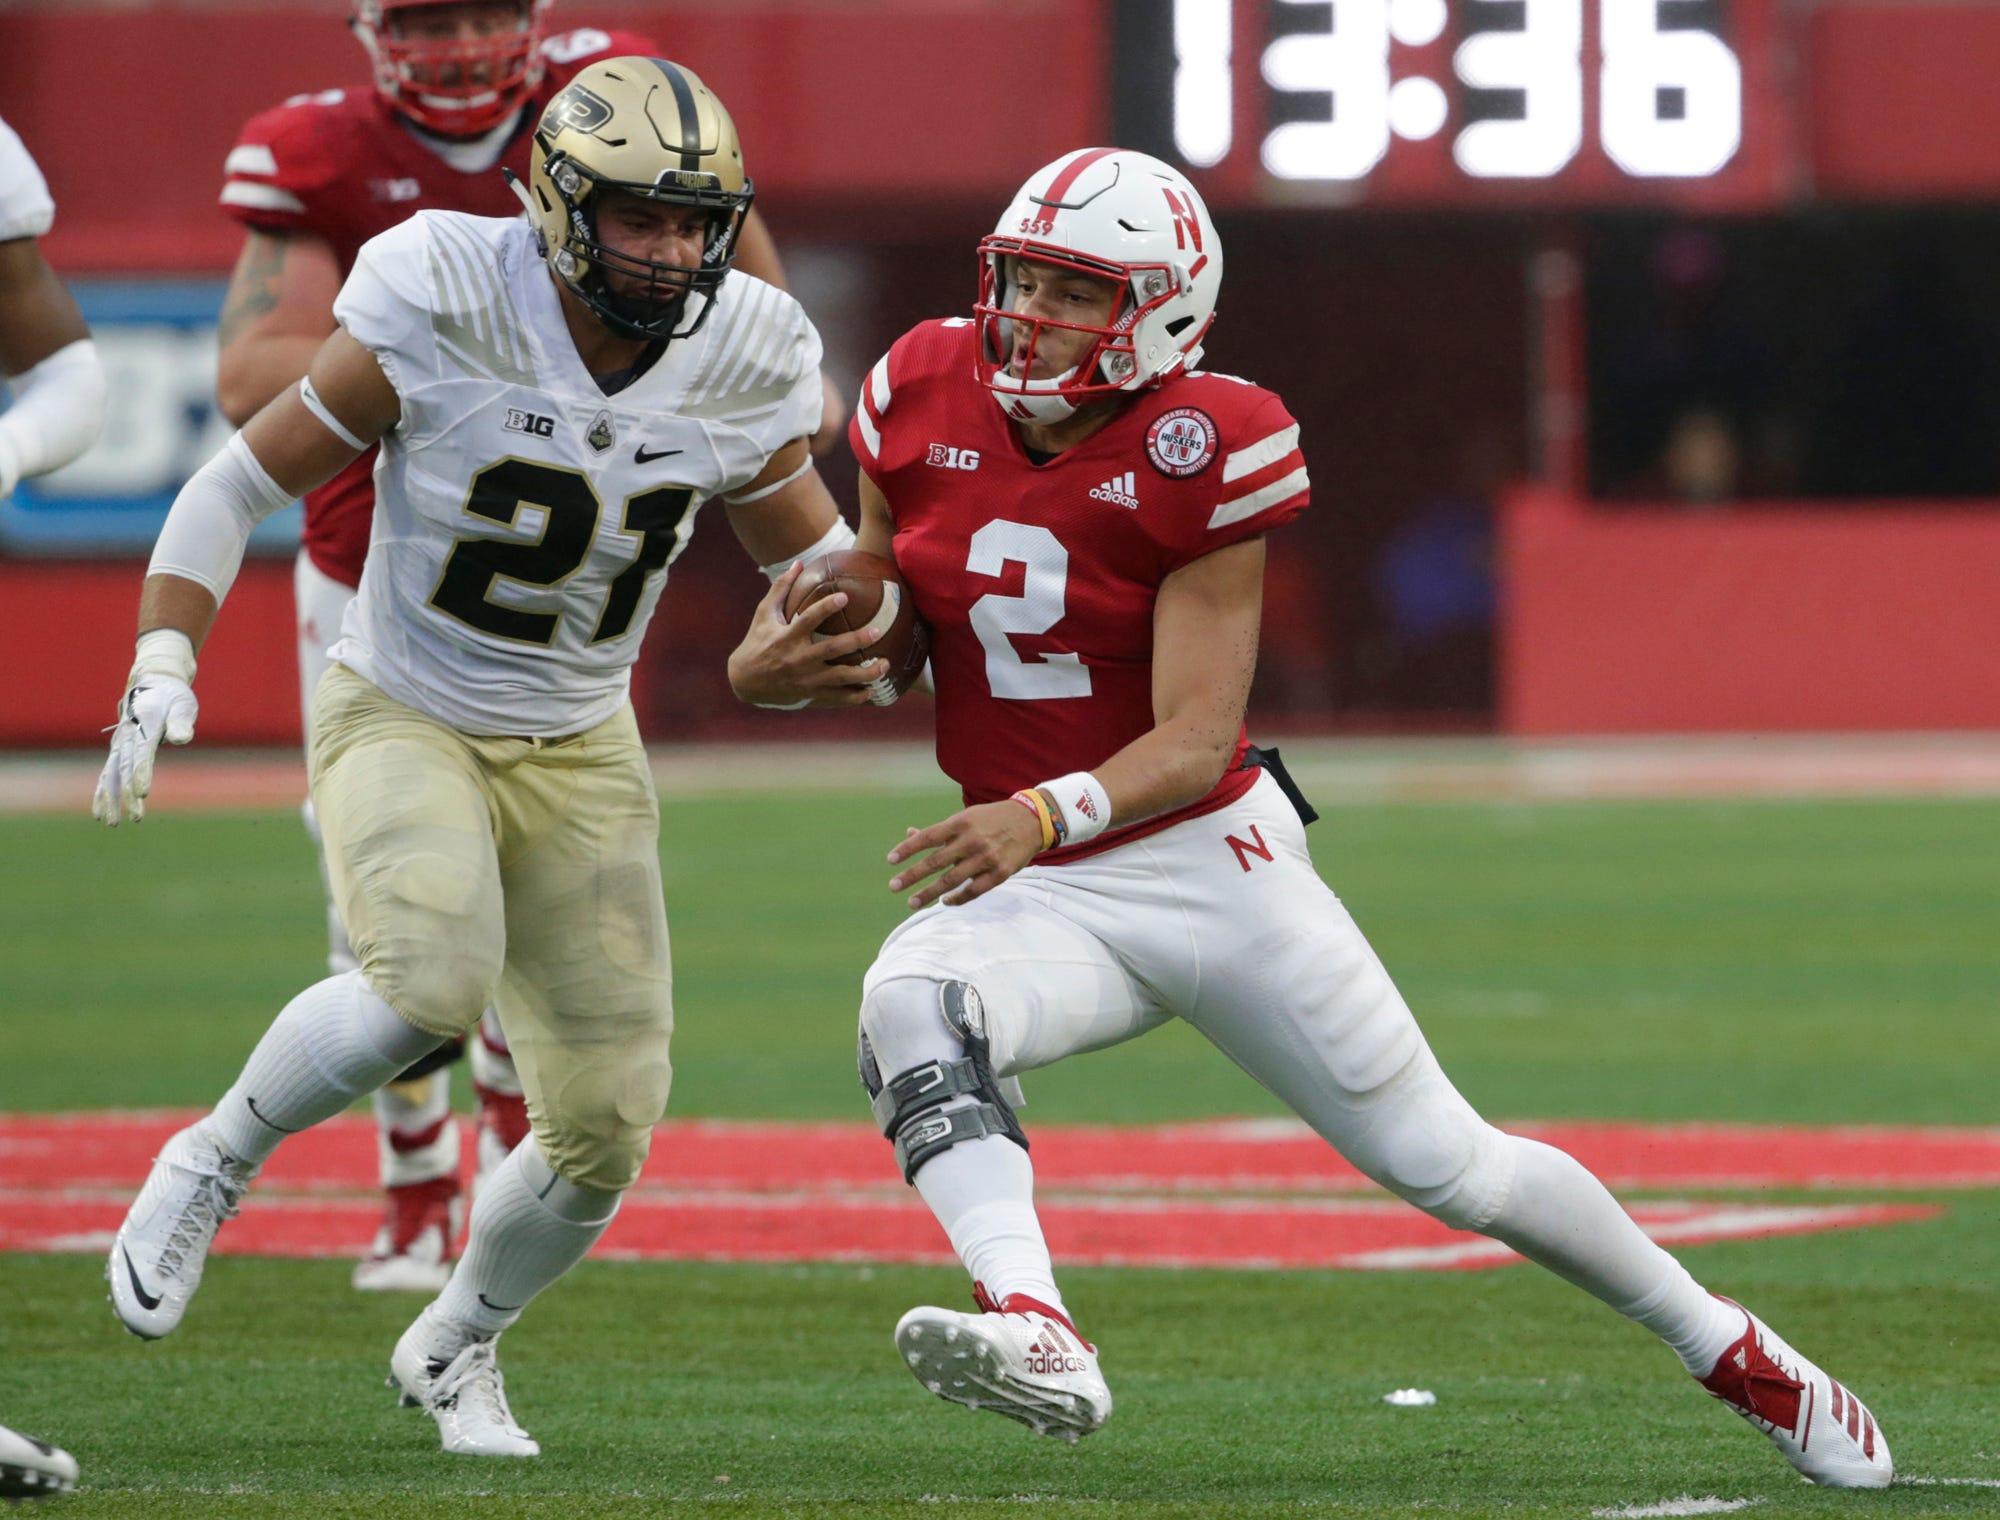 Nebraska quarterback Adrian Martinez (2) carries the ball against Purdue linebacker Markus Bailey (21) during the second half of an NCAA college football game in Lincoln, Neb., Saturday, Sept. 29, 2018. Purdue won 42-28. (AP Photo/Nati Harnik)